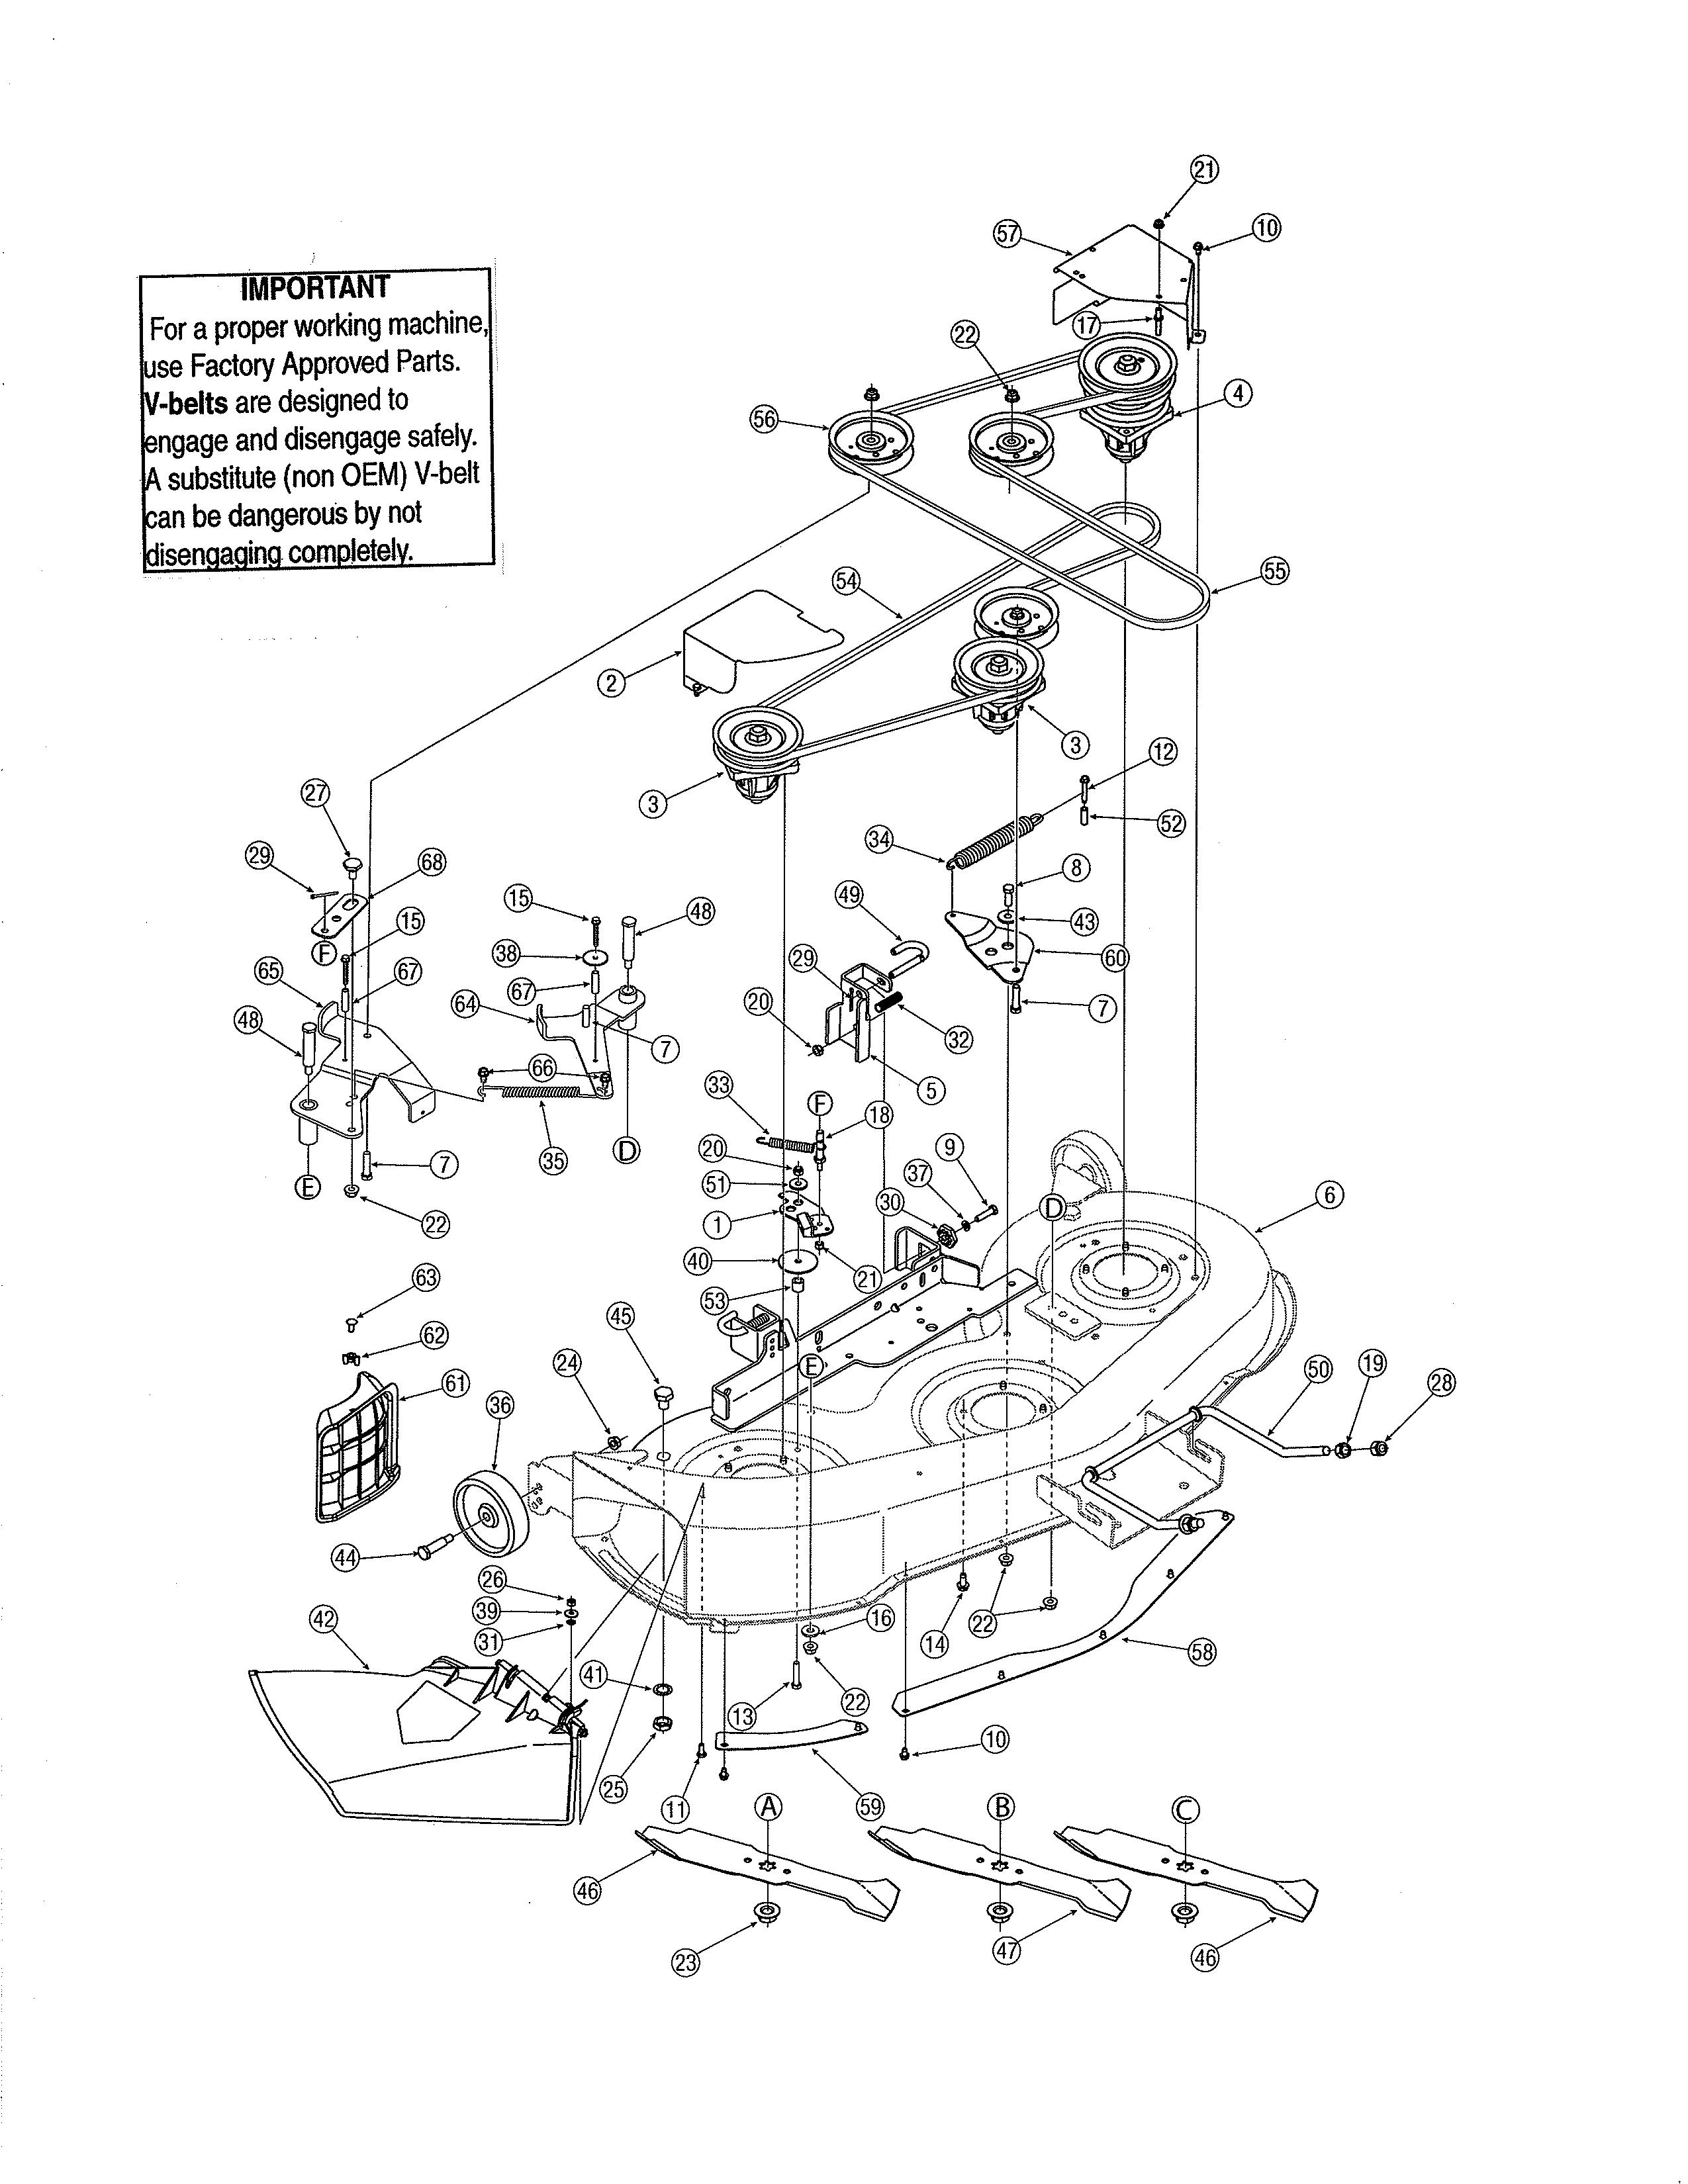 46 deck manual pto diagram parts list for model 13ap605h755 yardman parts riding mower tractor parts searspartsdirect [ 2550 x 3300 Pixel ]